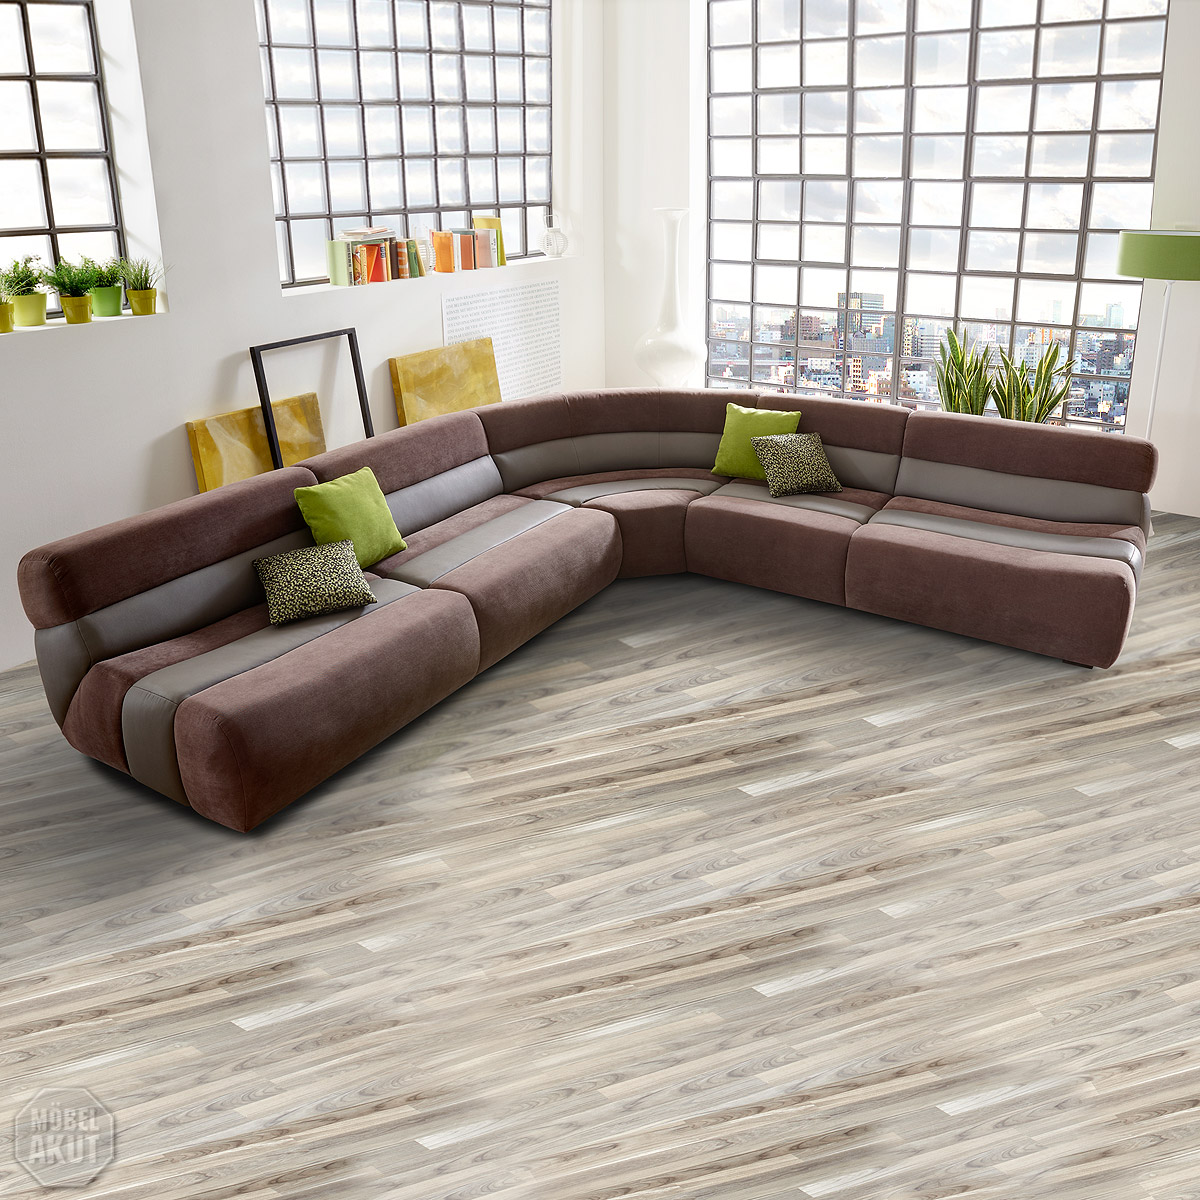 eckgarnitur scout ecksofa sofa wohnlandschaft polsterm bel. Black Bedroom Furniture Sets. Home Design Ideas